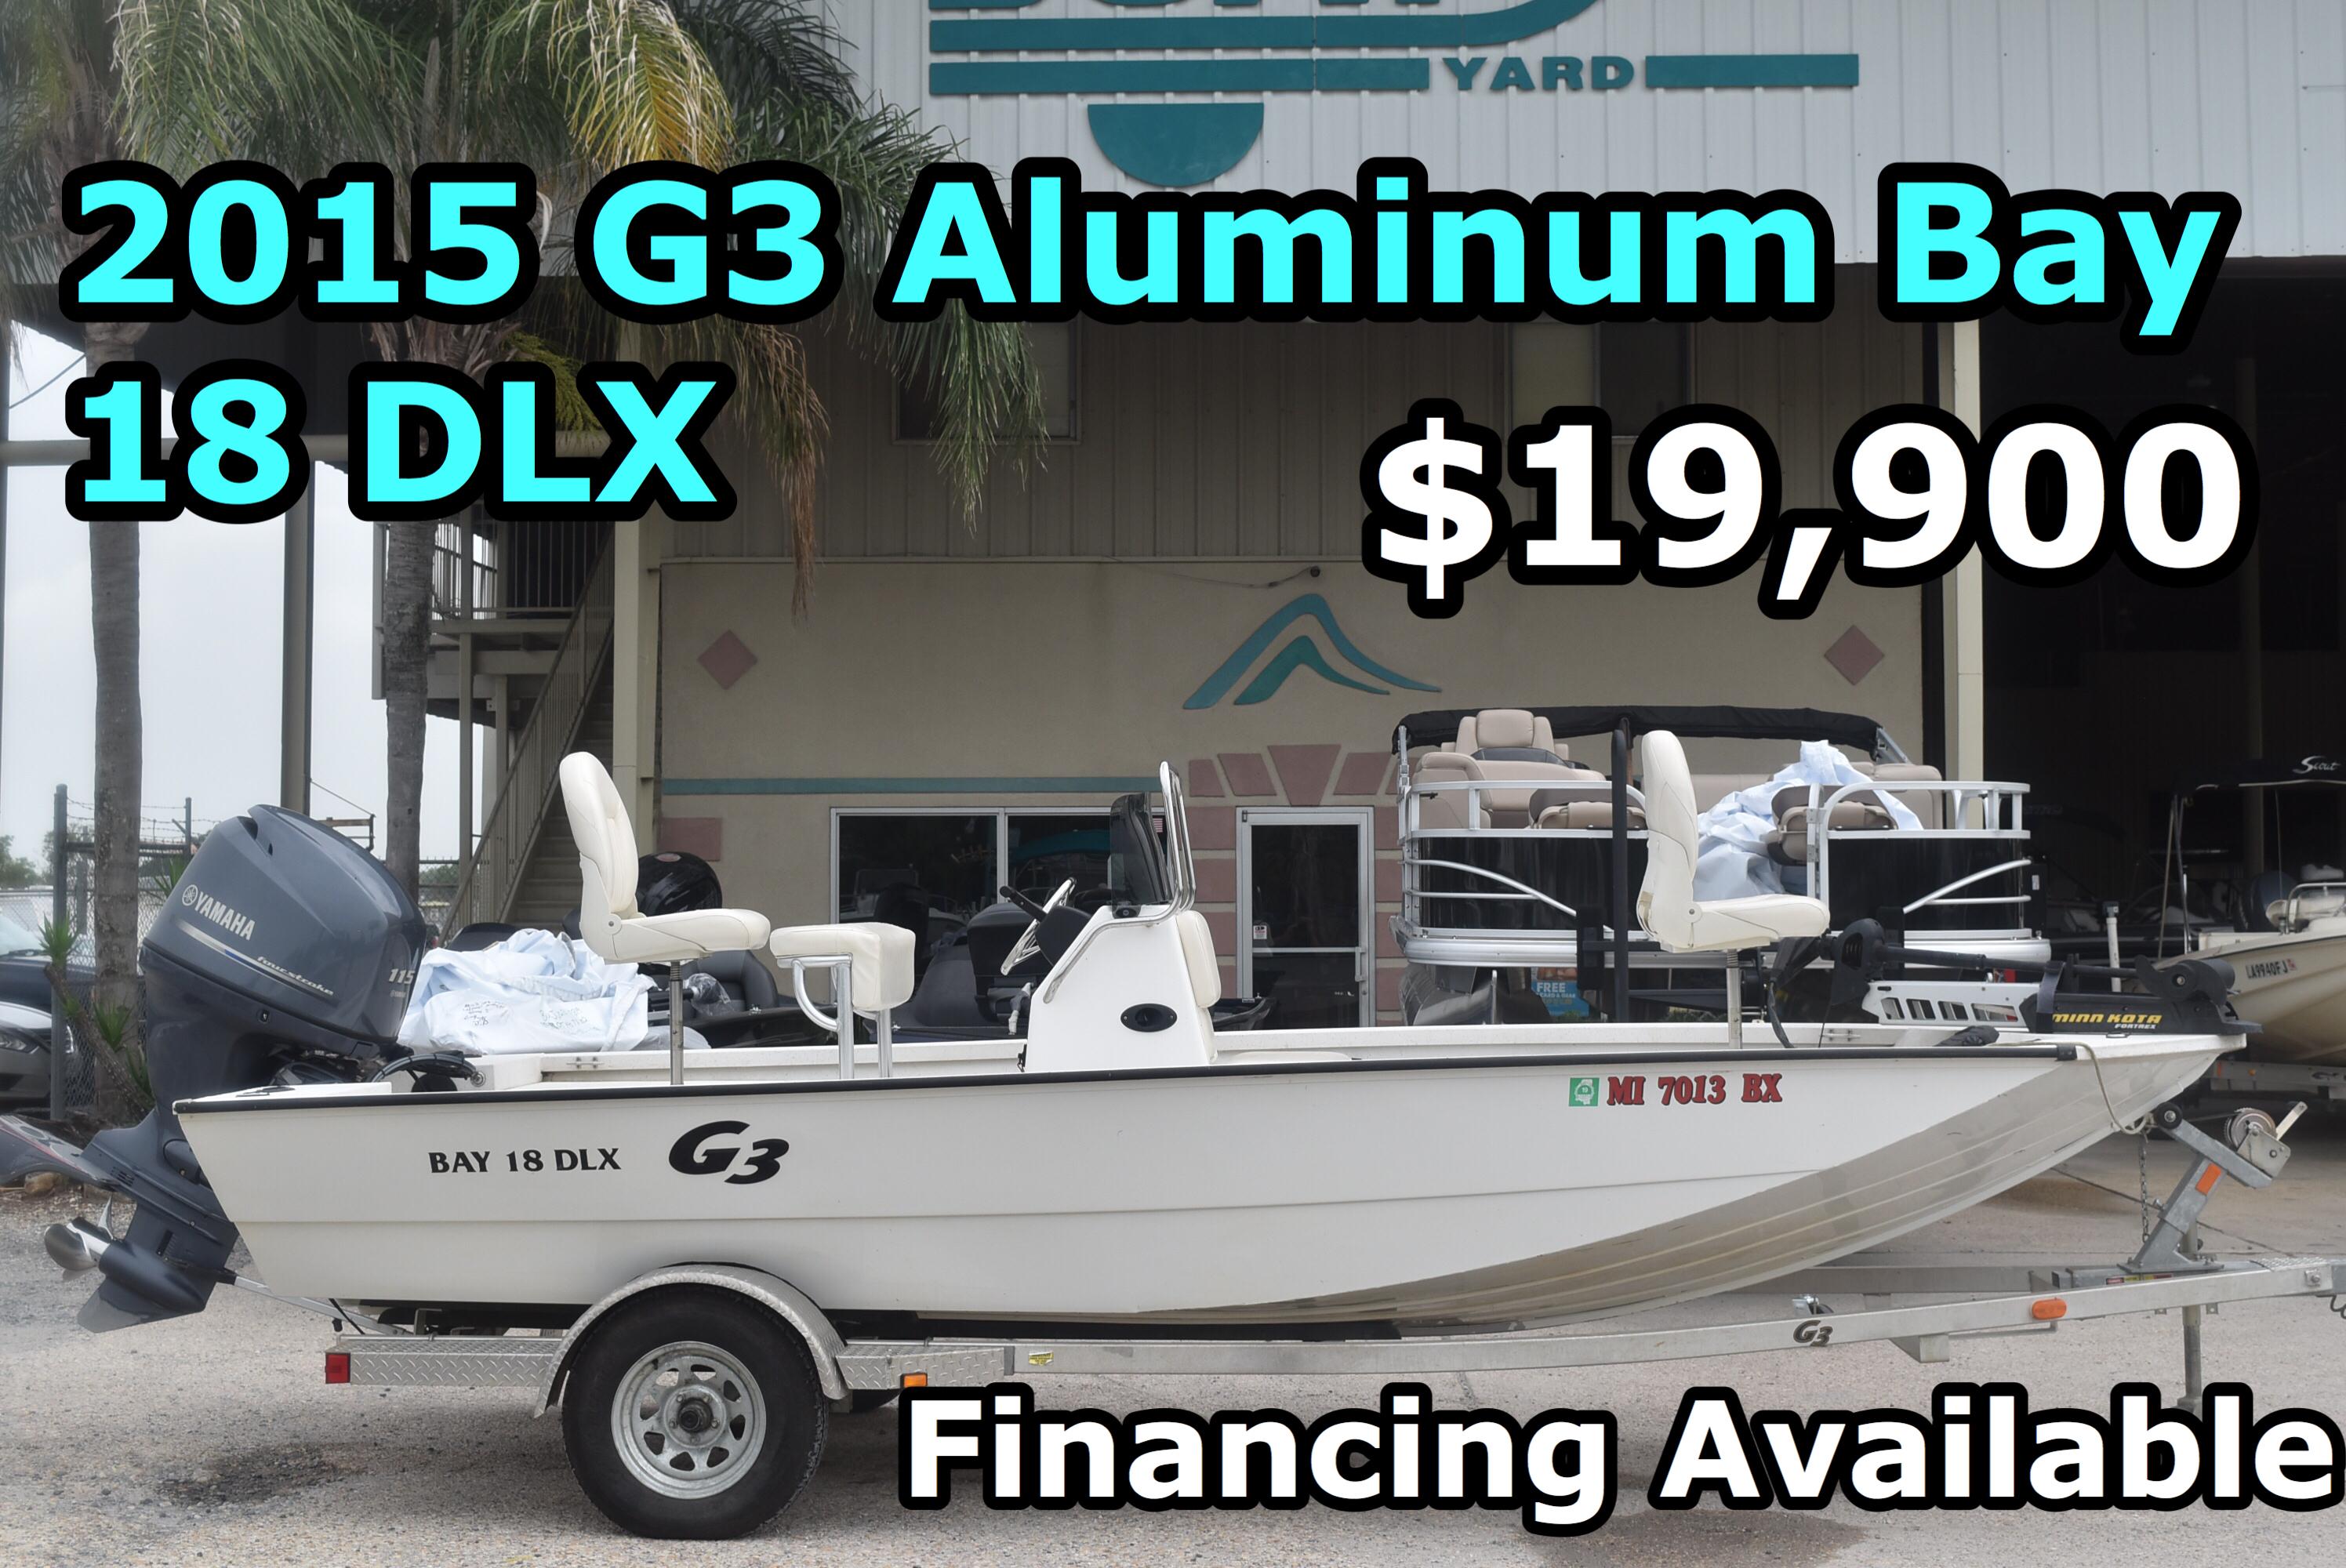 G3 Bay 18 DLX